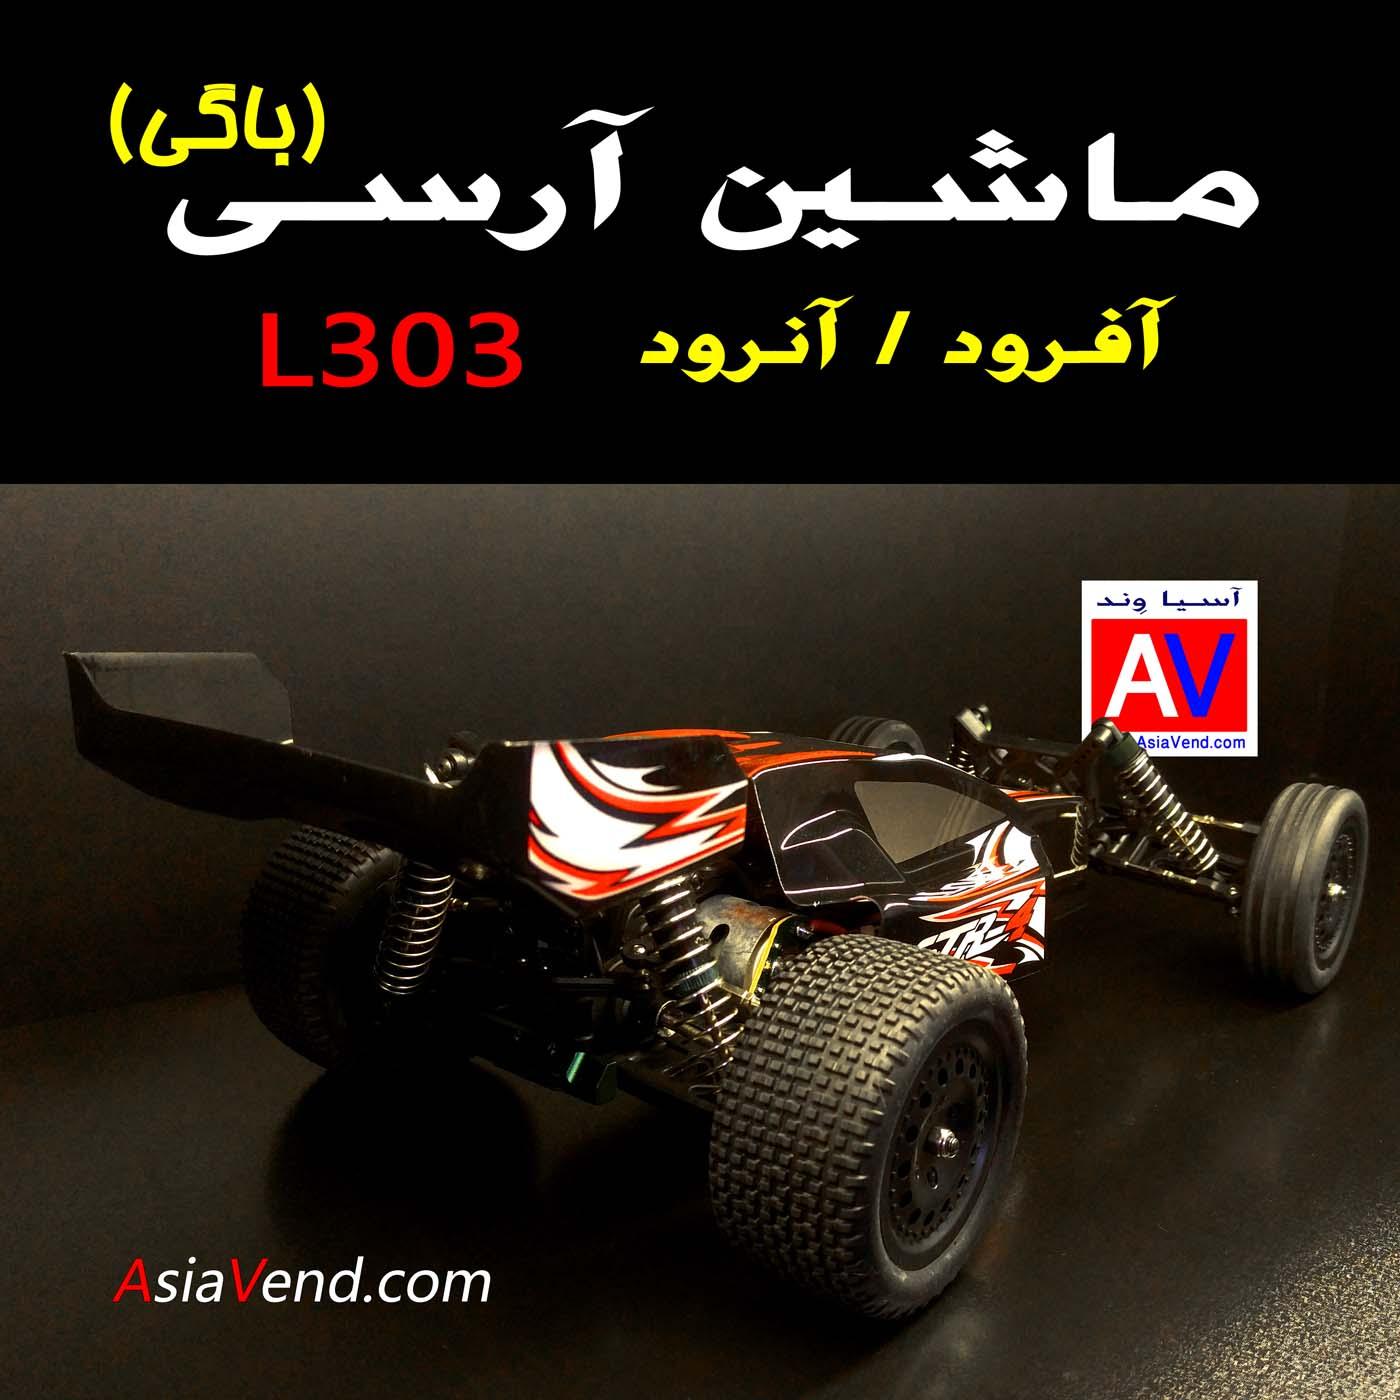 WL TOYS L303 PRICE ماشین رادیو کنترلی L303